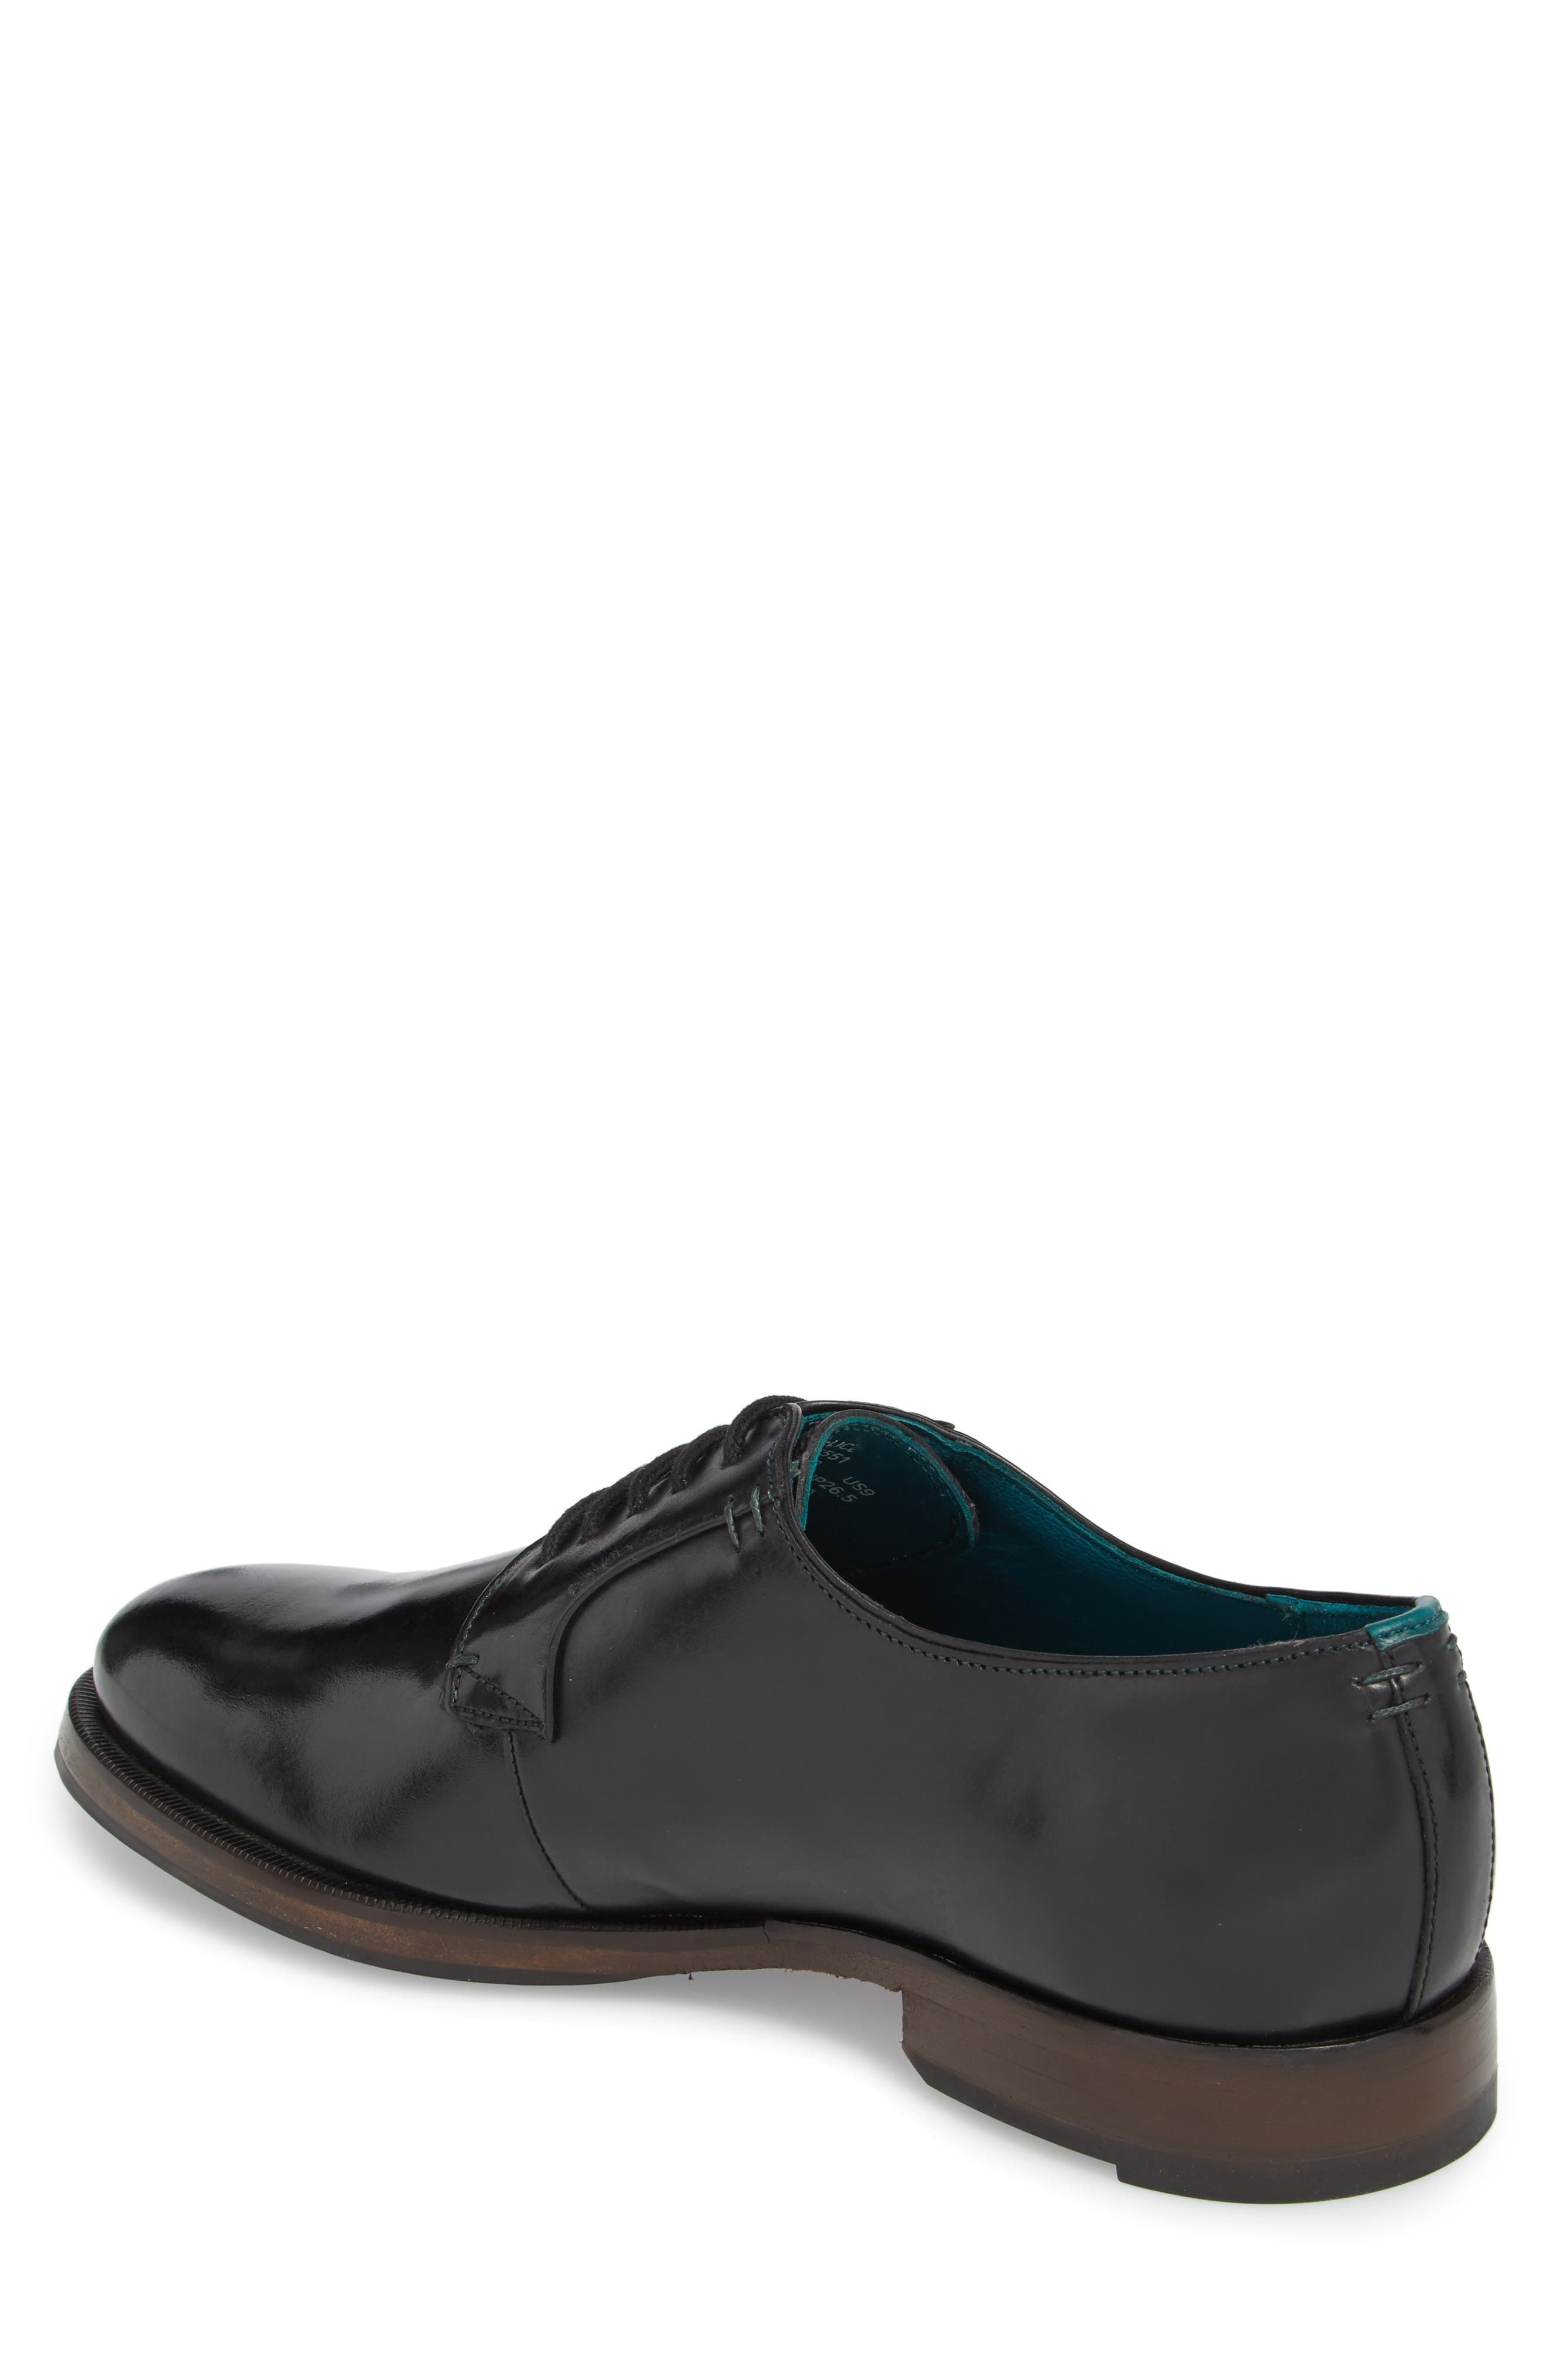 Silice Plain Toe Derby,                             Alternate thumbnail 2, color,                             BLACK LEATHER